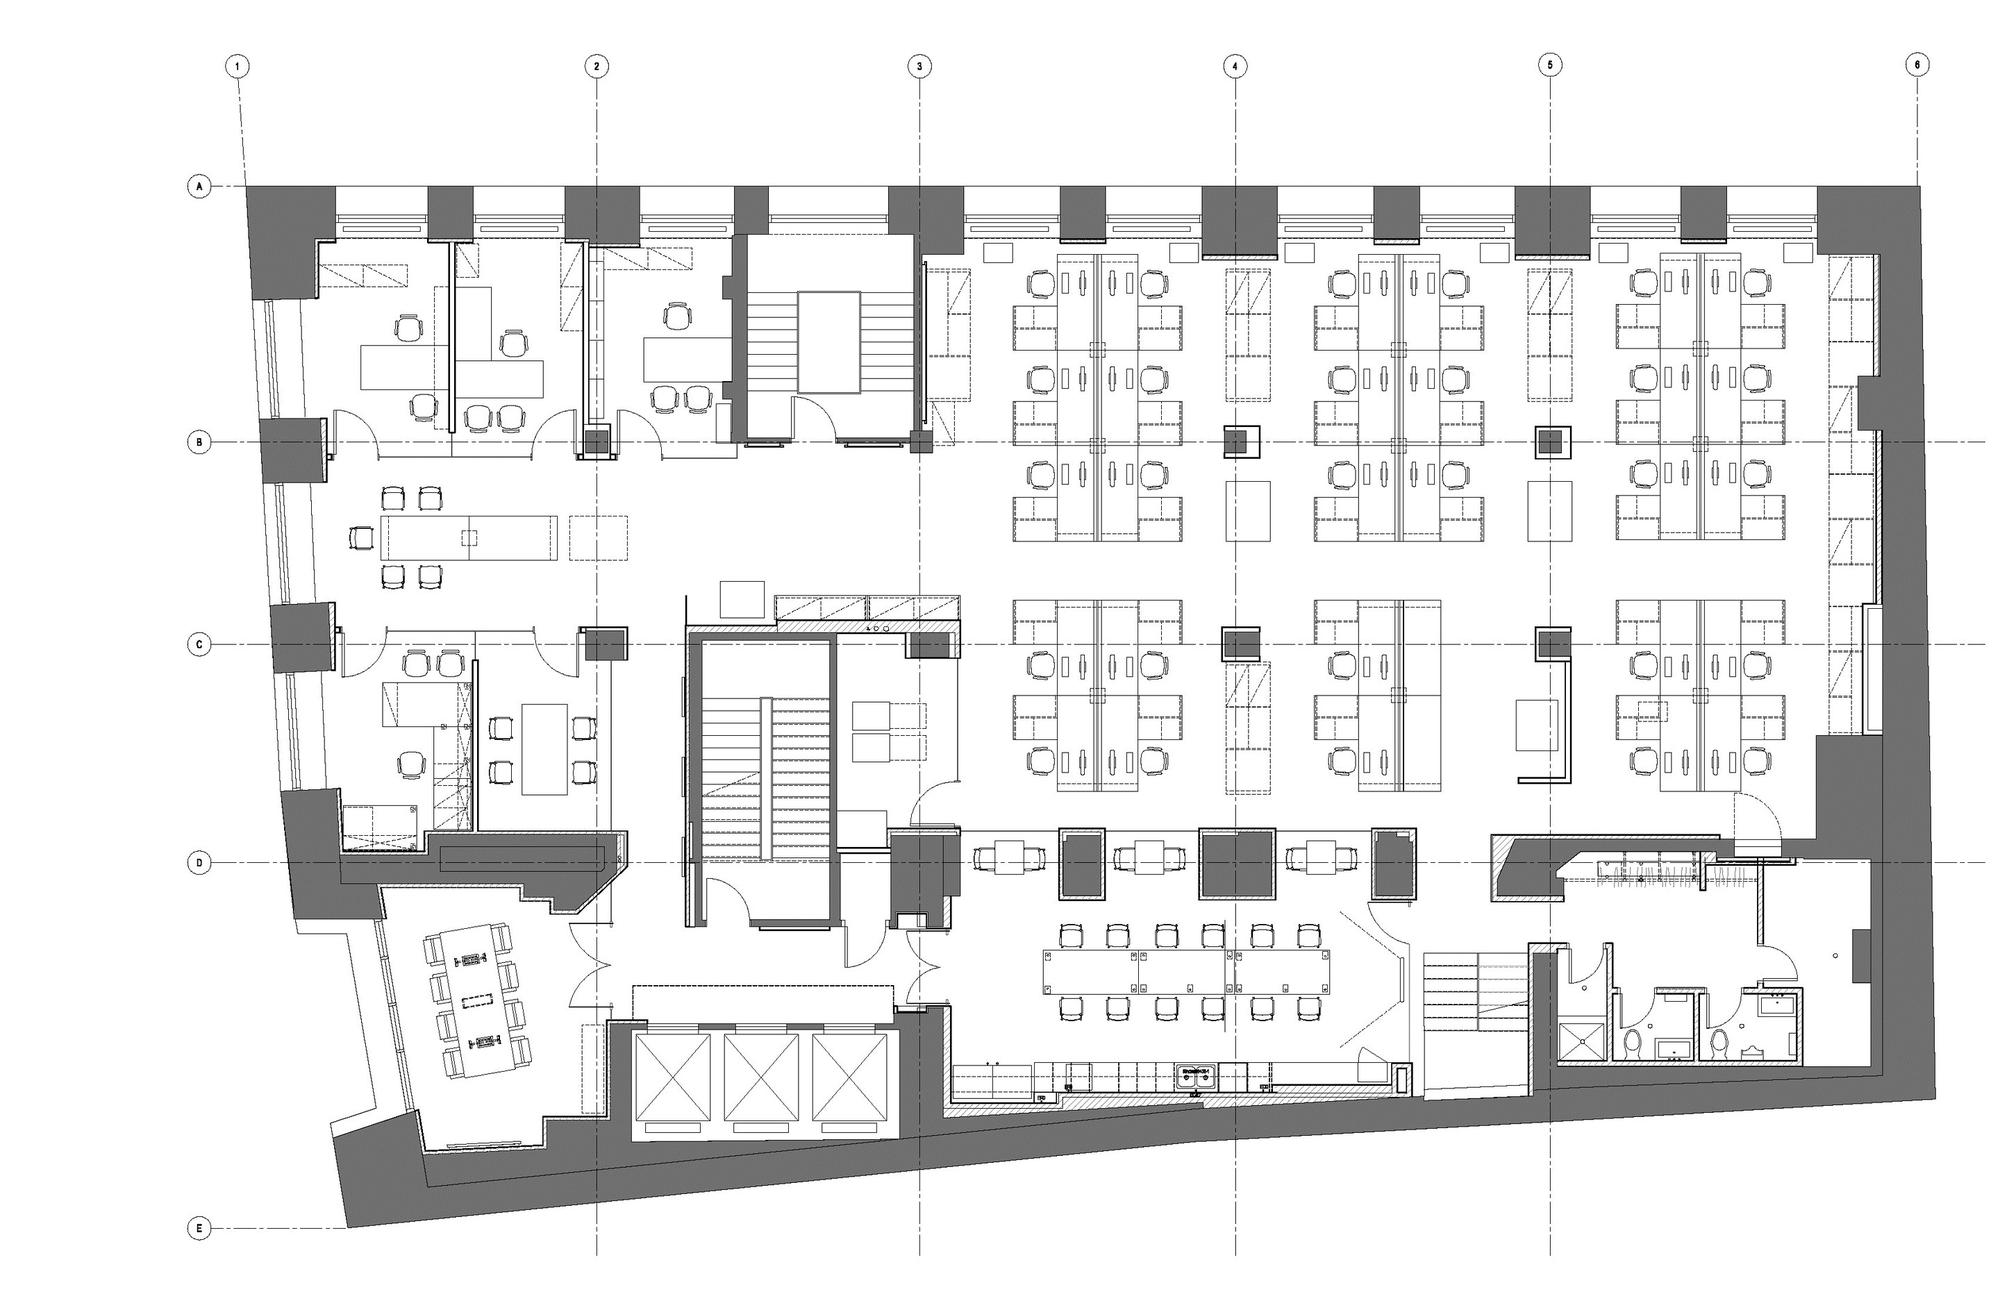 gallery of bureau 100 nfoe 9. Black Bedroom Furniture Sets. Home Design Ideas